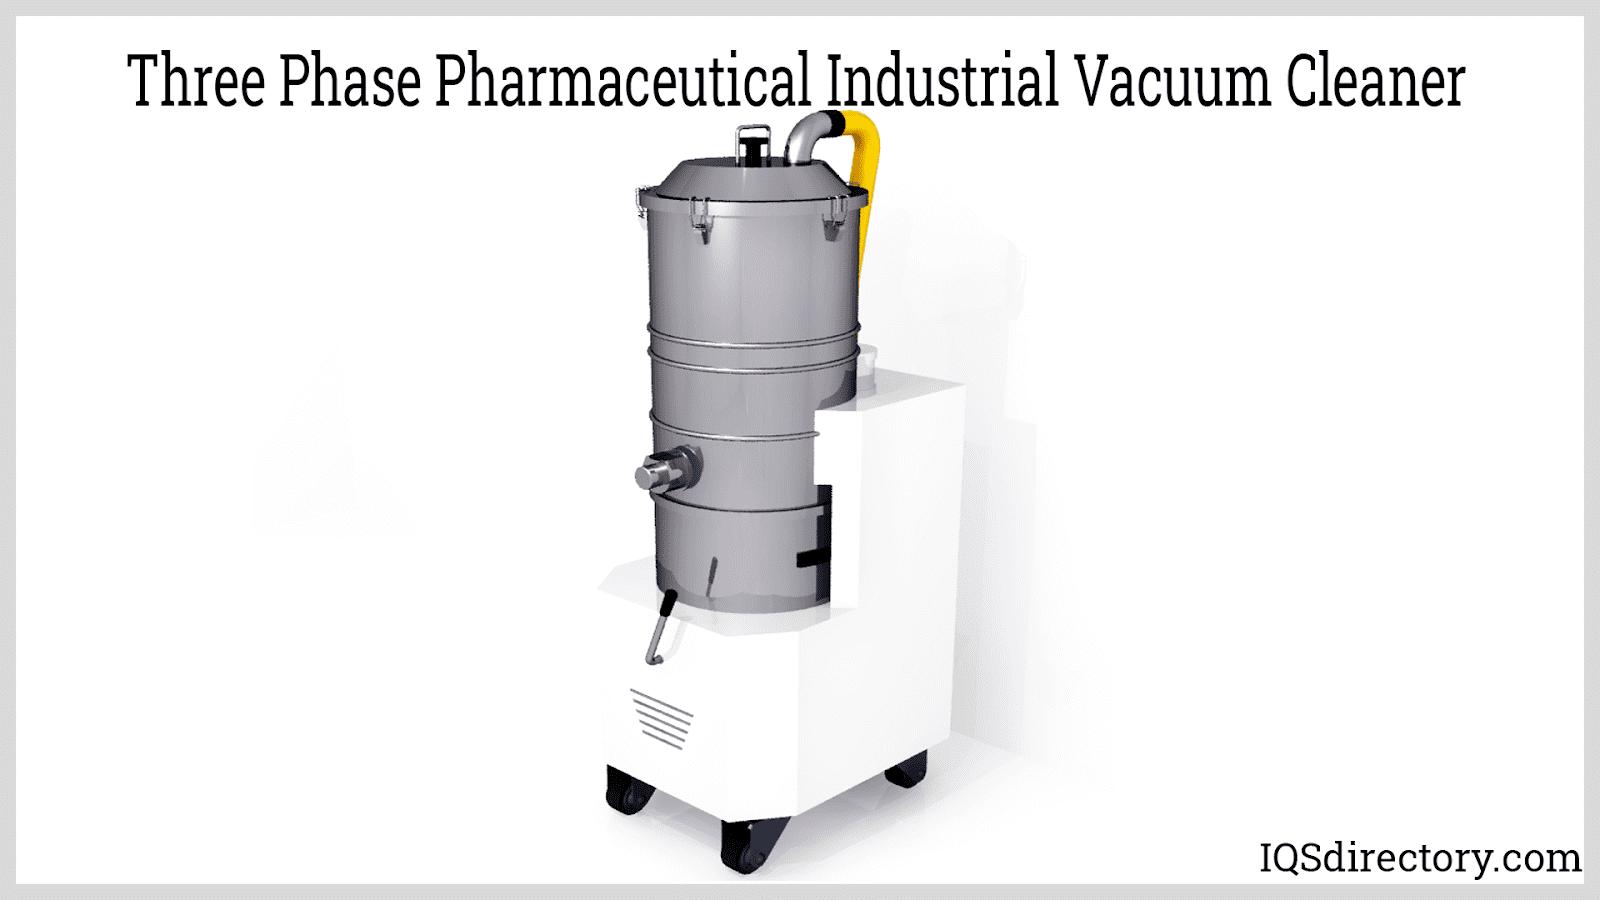 Three Phase Pharmaceutical Industrial Vacuum Cleaner